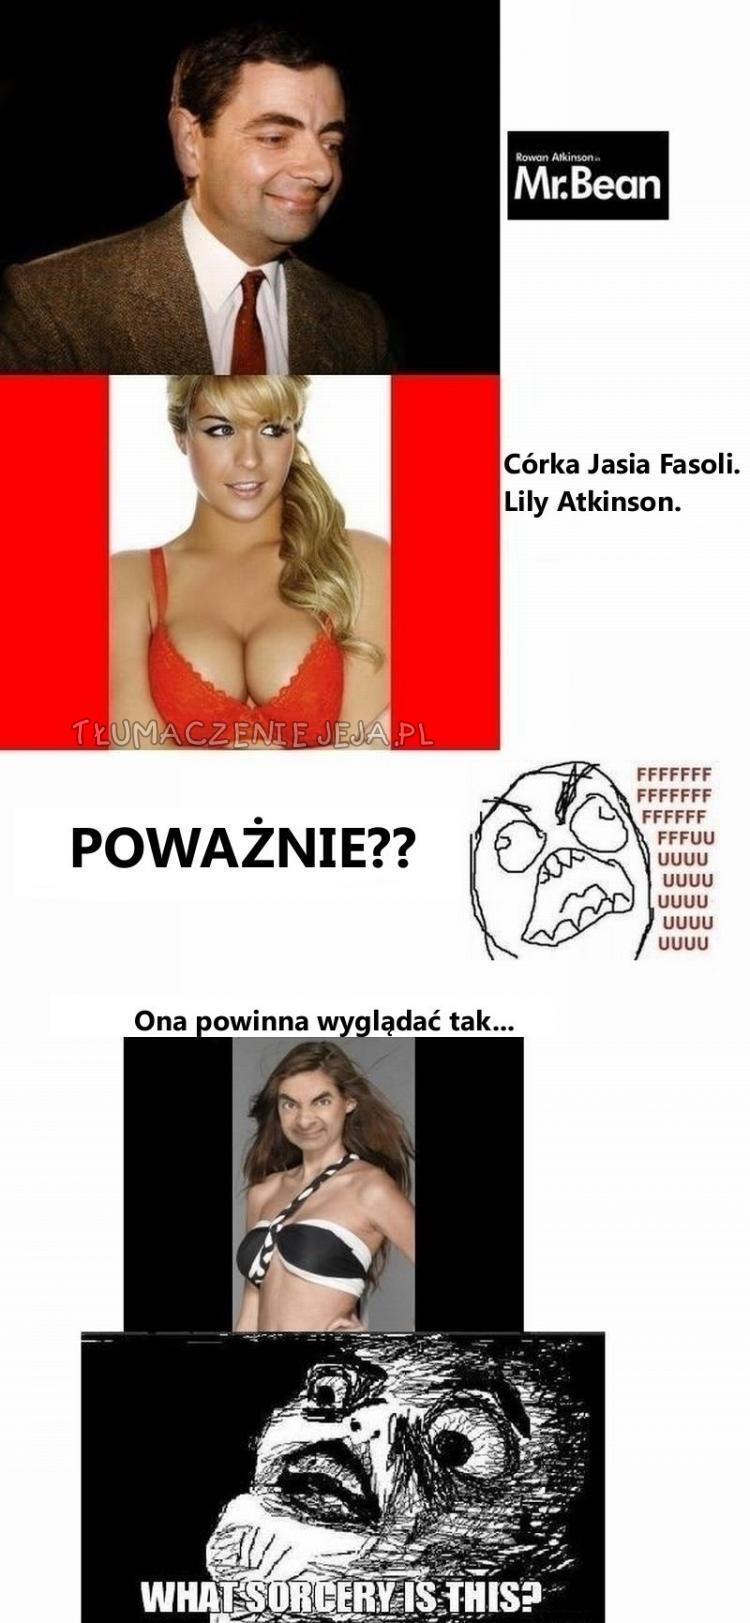 Córka Jasia Fasoli